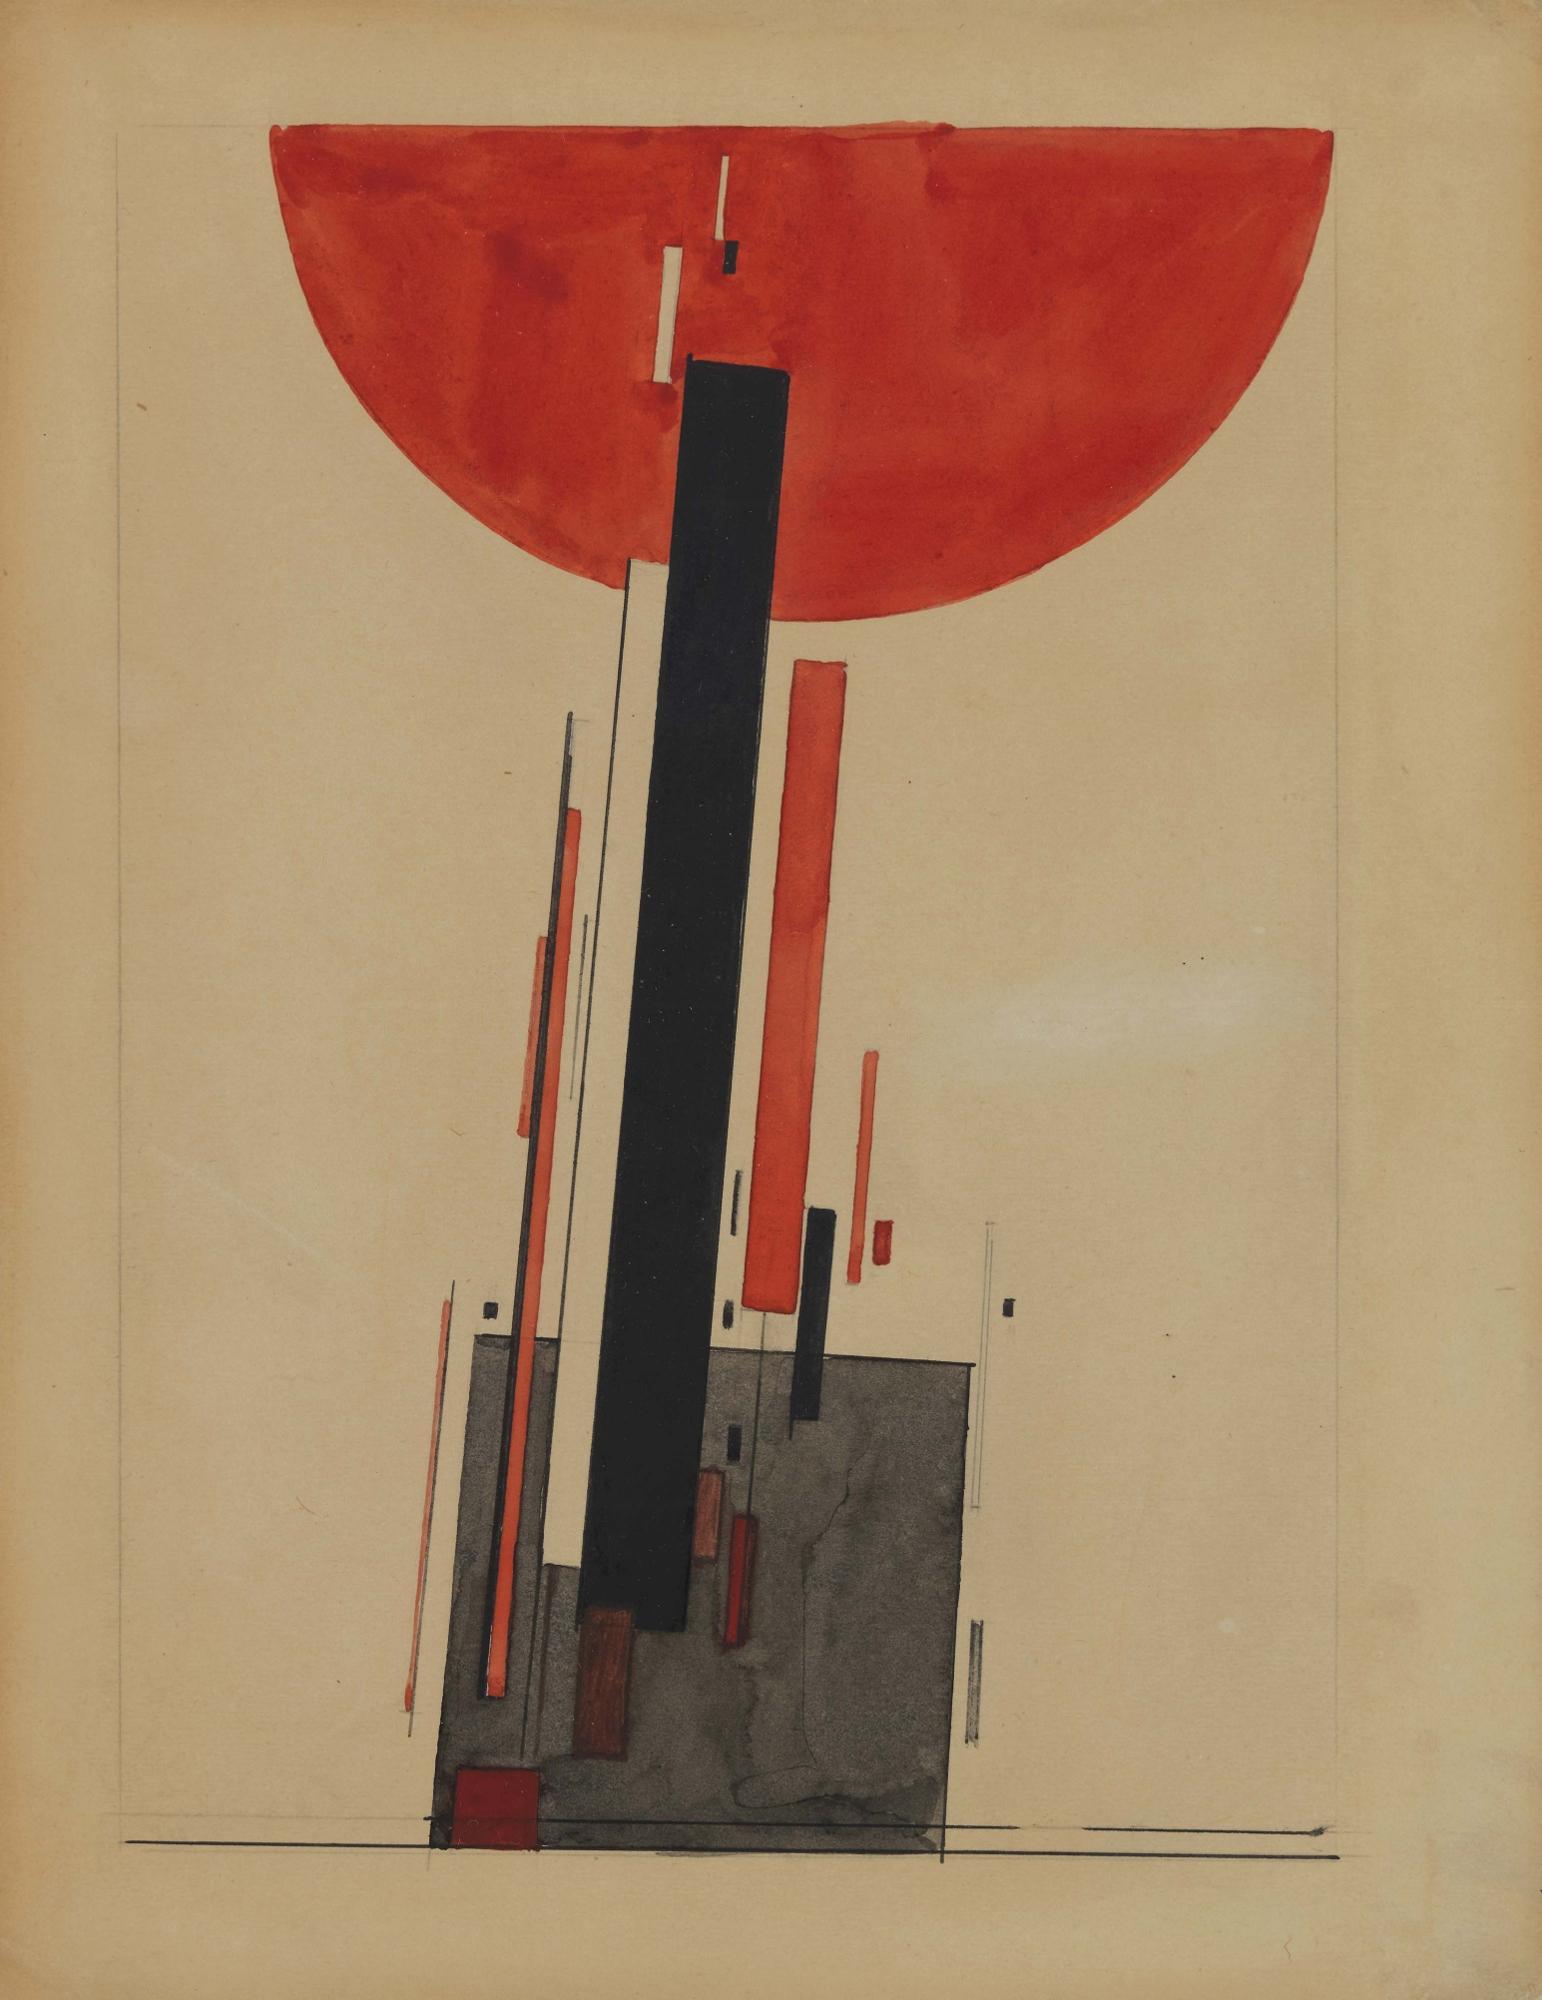 Vertical Axes in Motion, 1922/23 - Ilya Chashnik